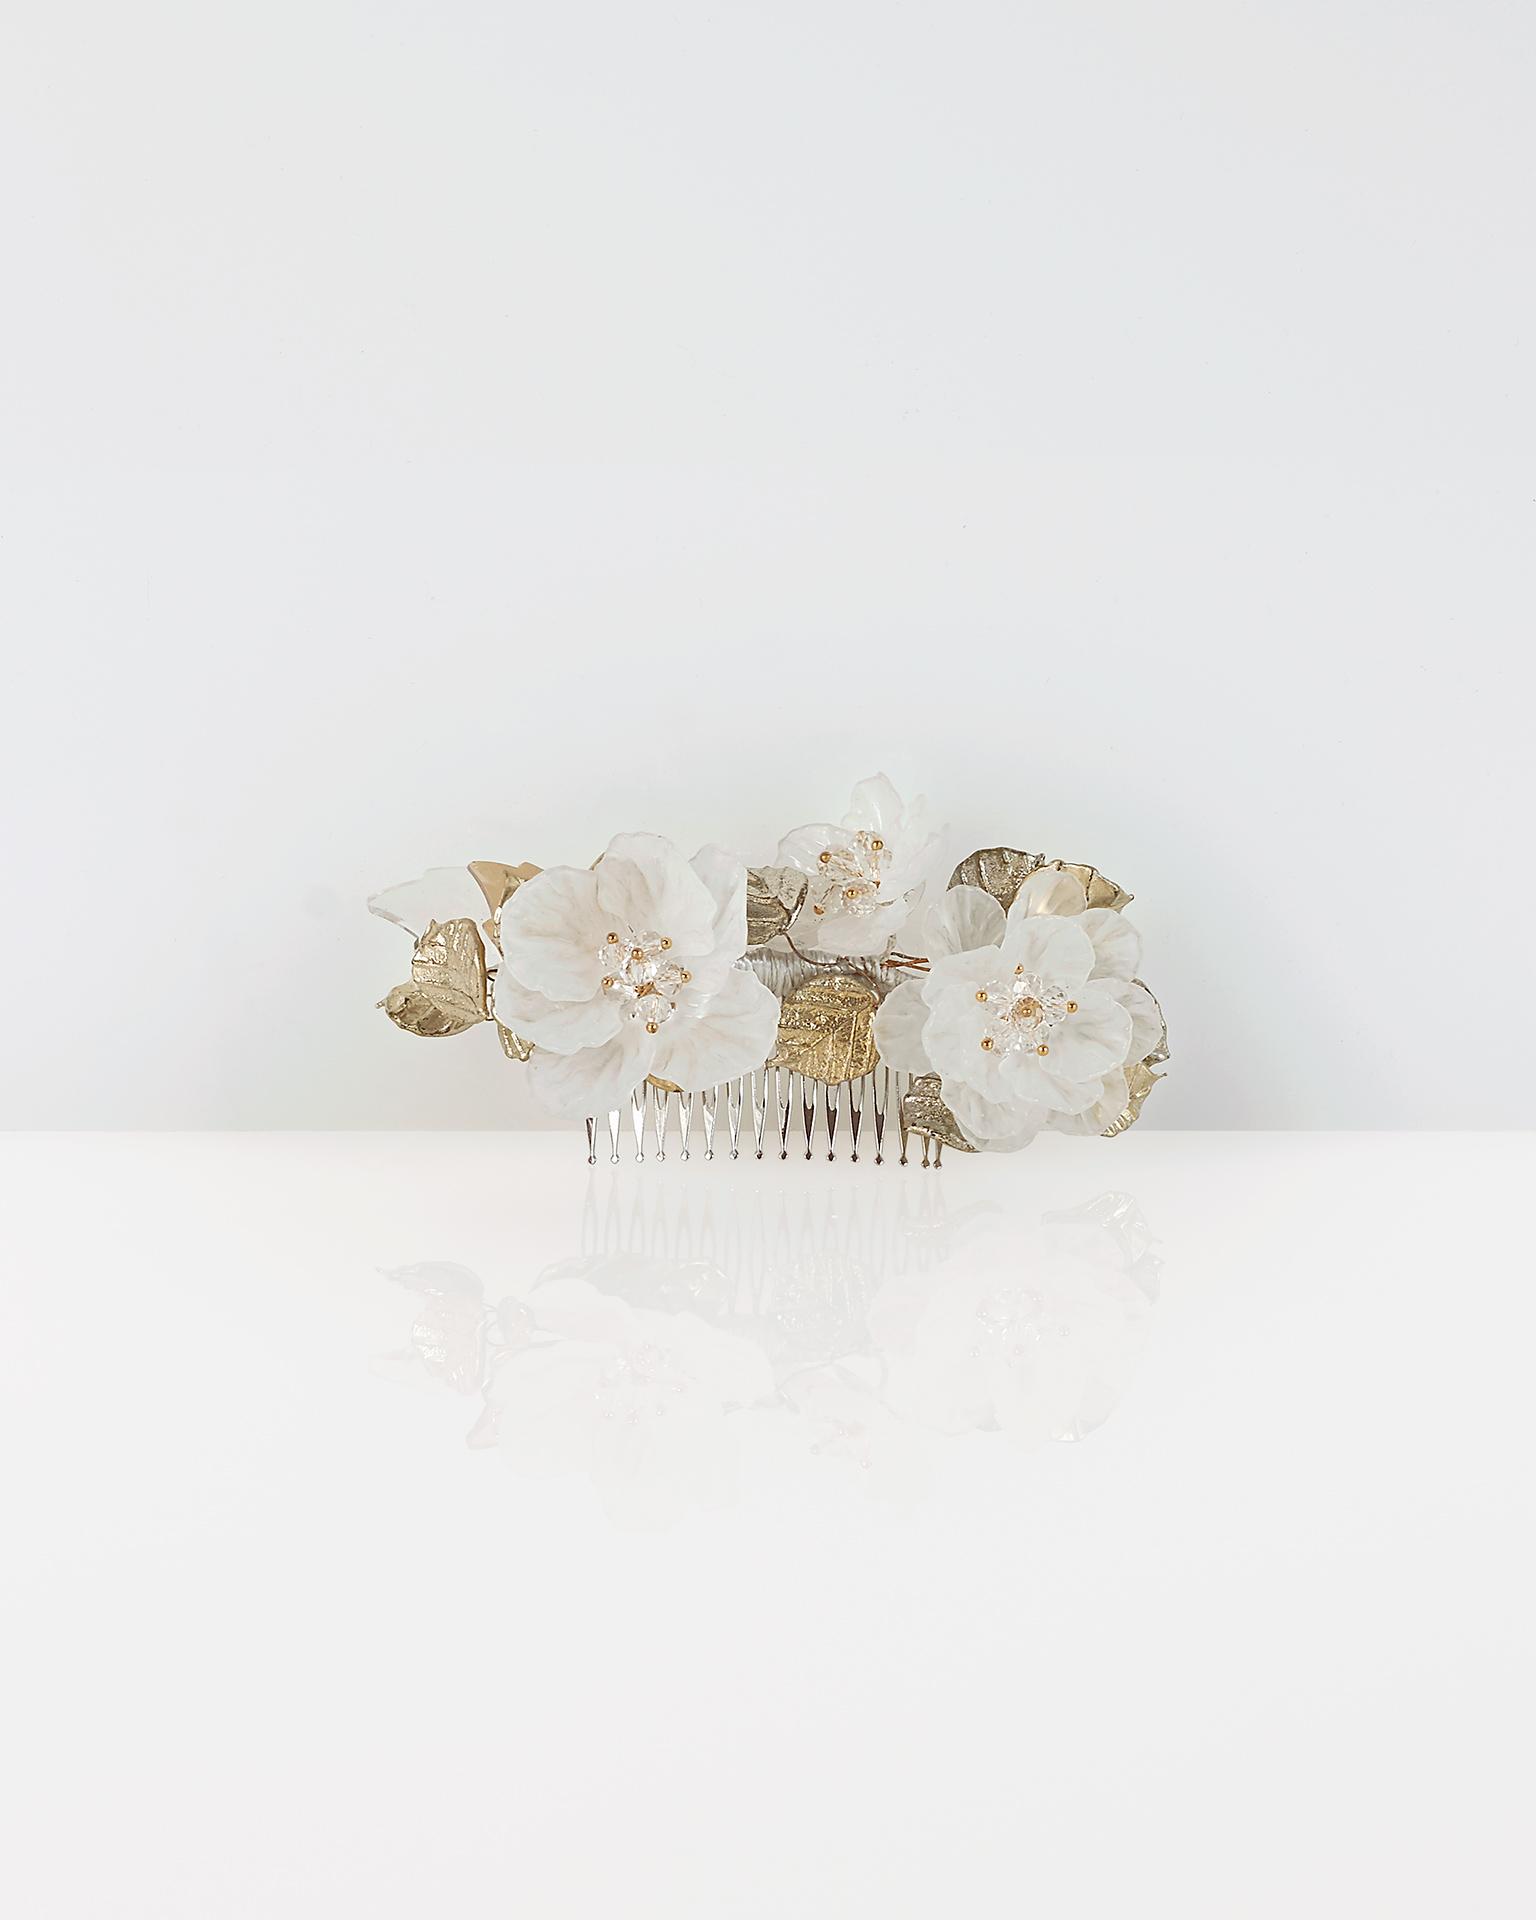 Crystal and metal bridal mantilla comb. 2018  Collection.